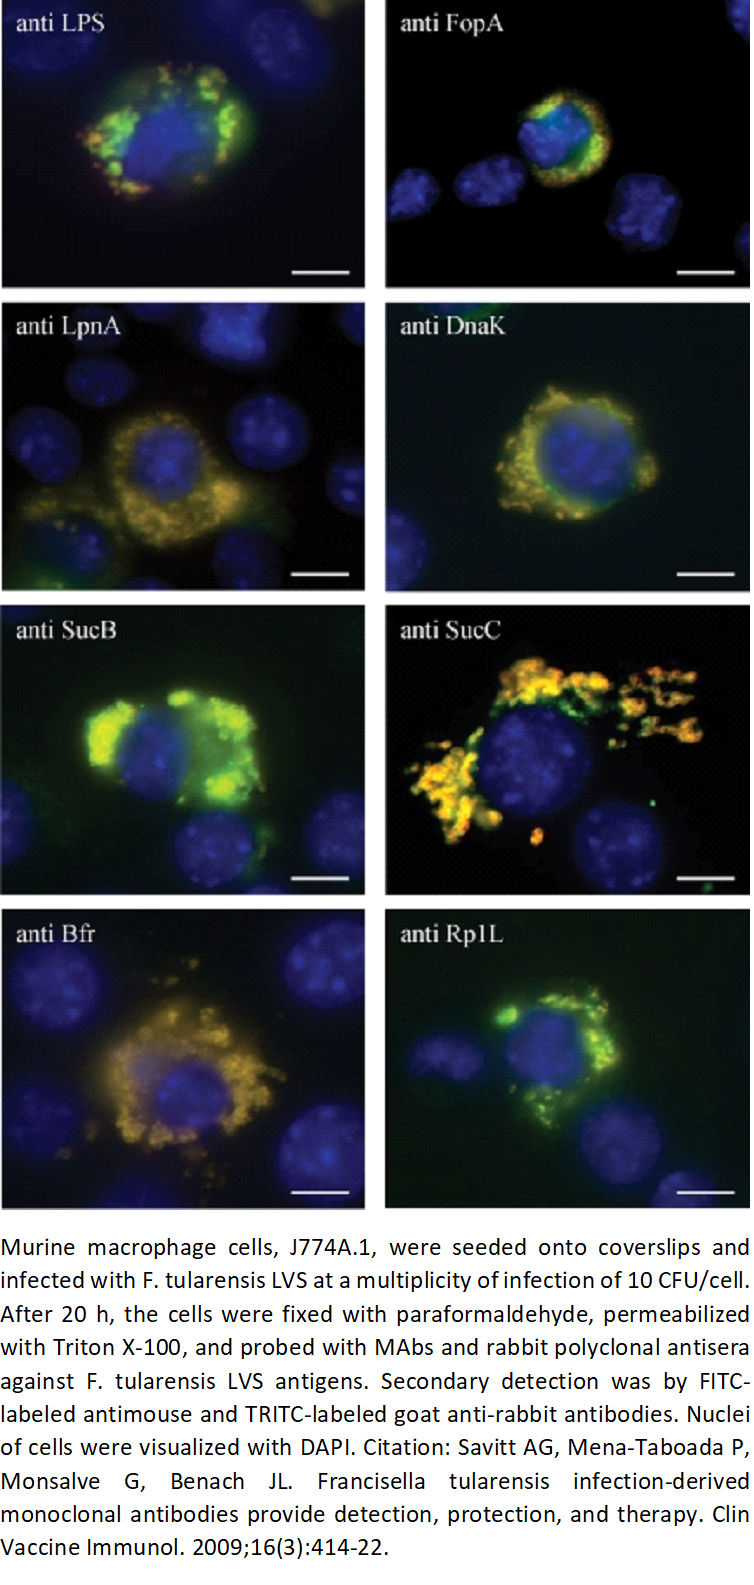 Image thumbnail for Anti-F. tularensis LVS 50S Ribosomal Protein L7/L12 (Rp1L) [109] Antibody